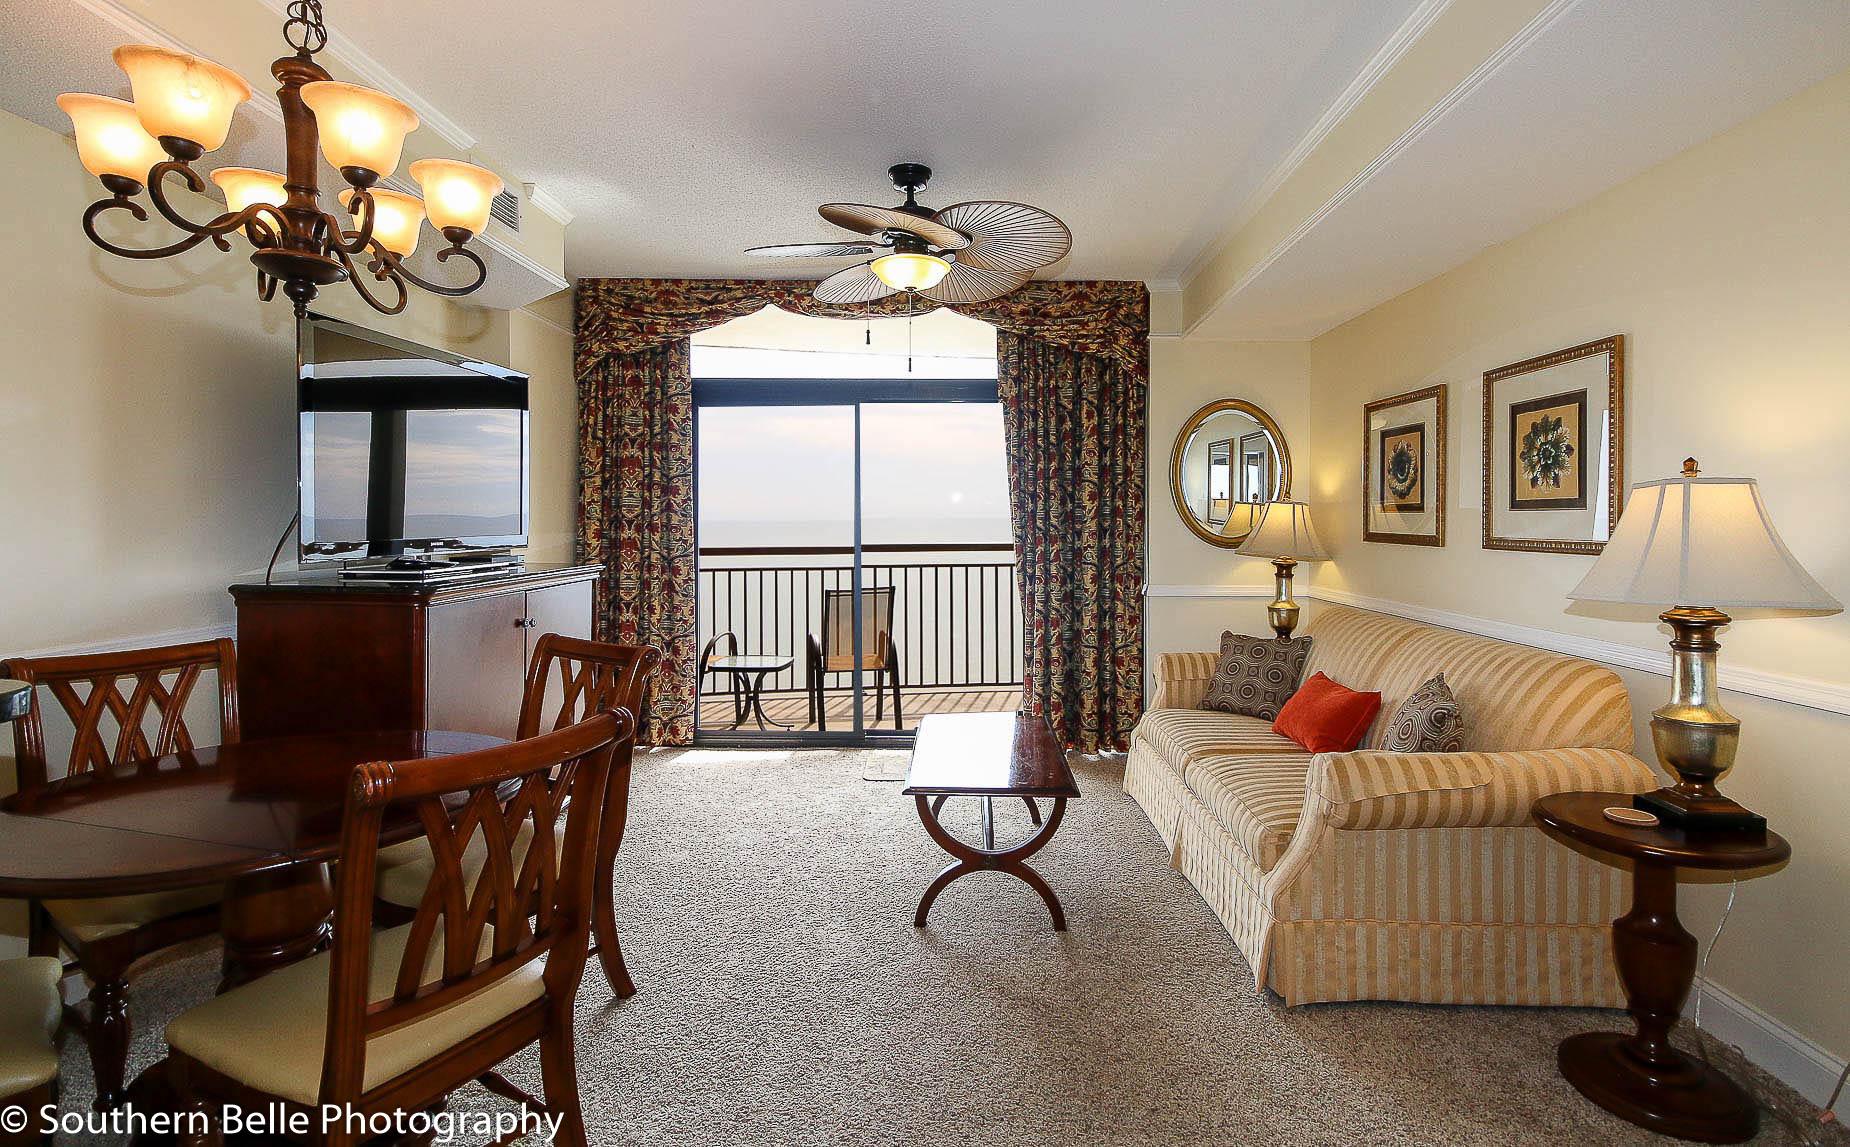 17. Living Room & Balc. View WM